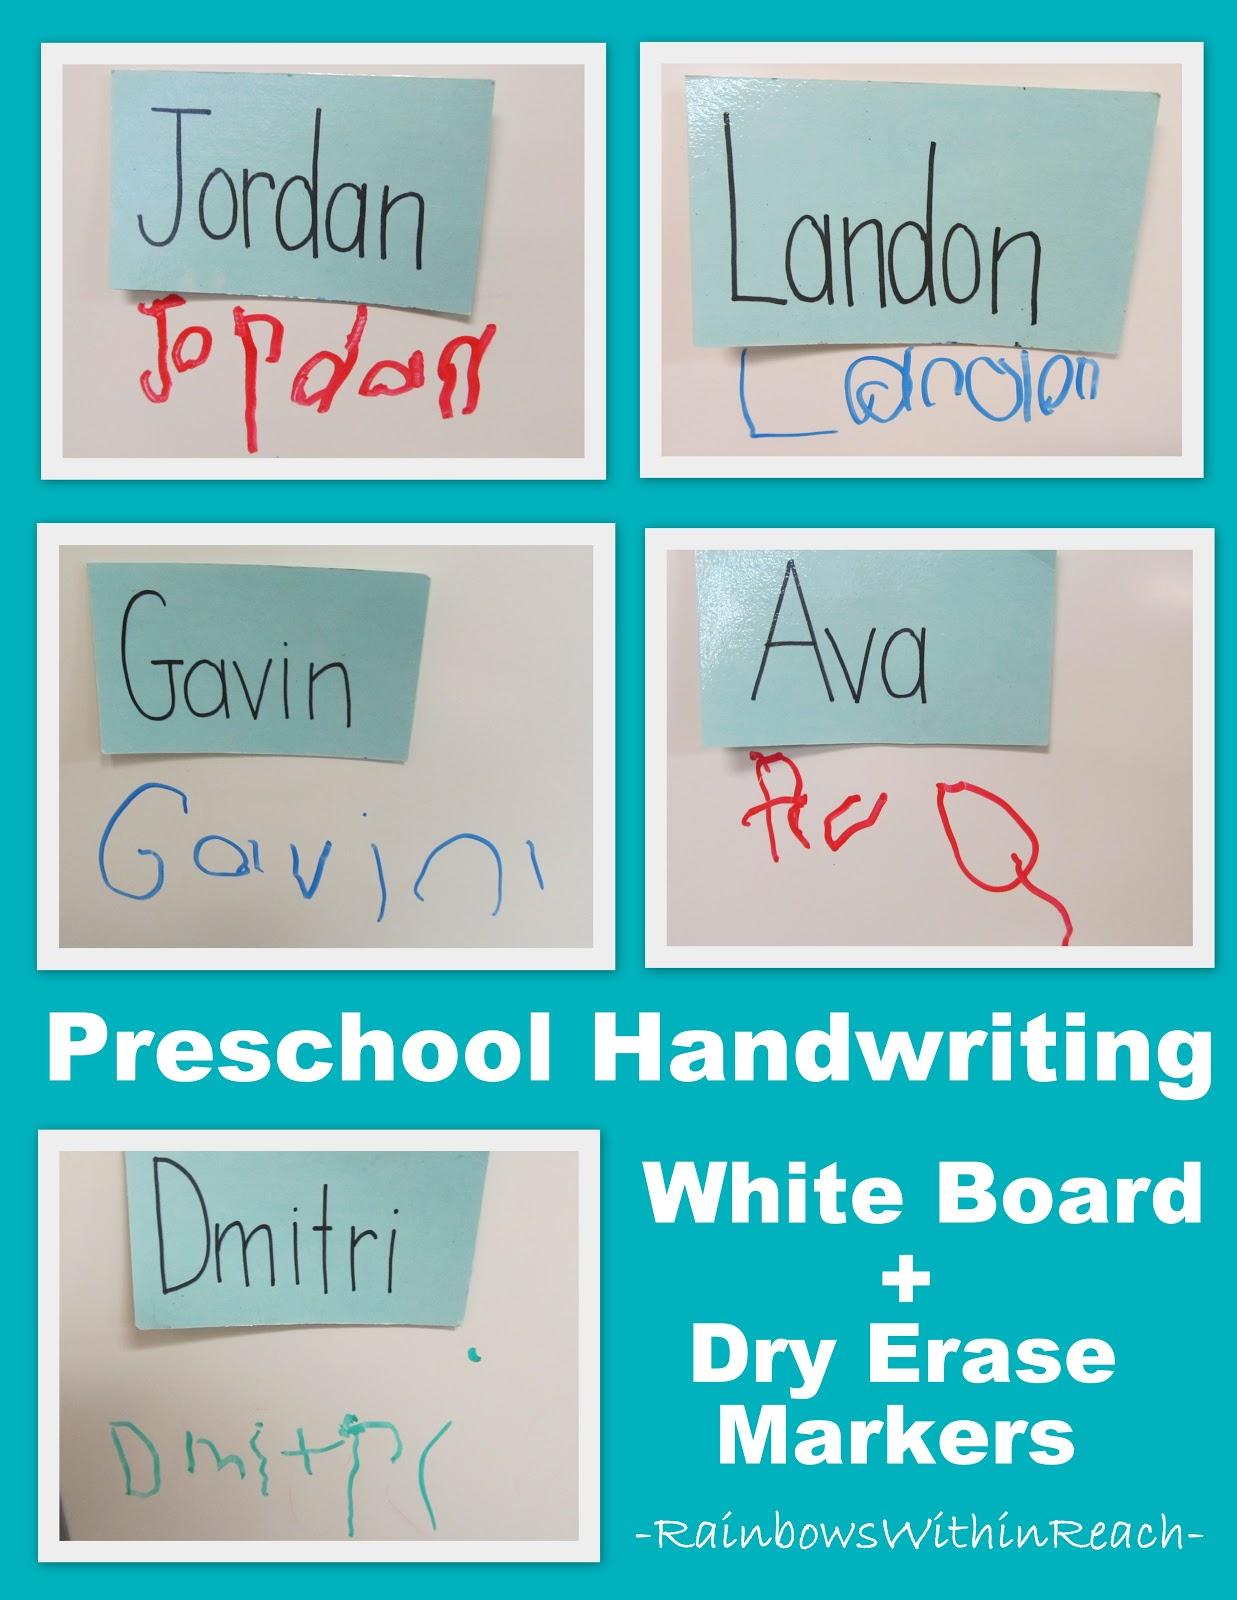 Preschool Writing Center: Www.rainbowswithinreach.blogspot.com